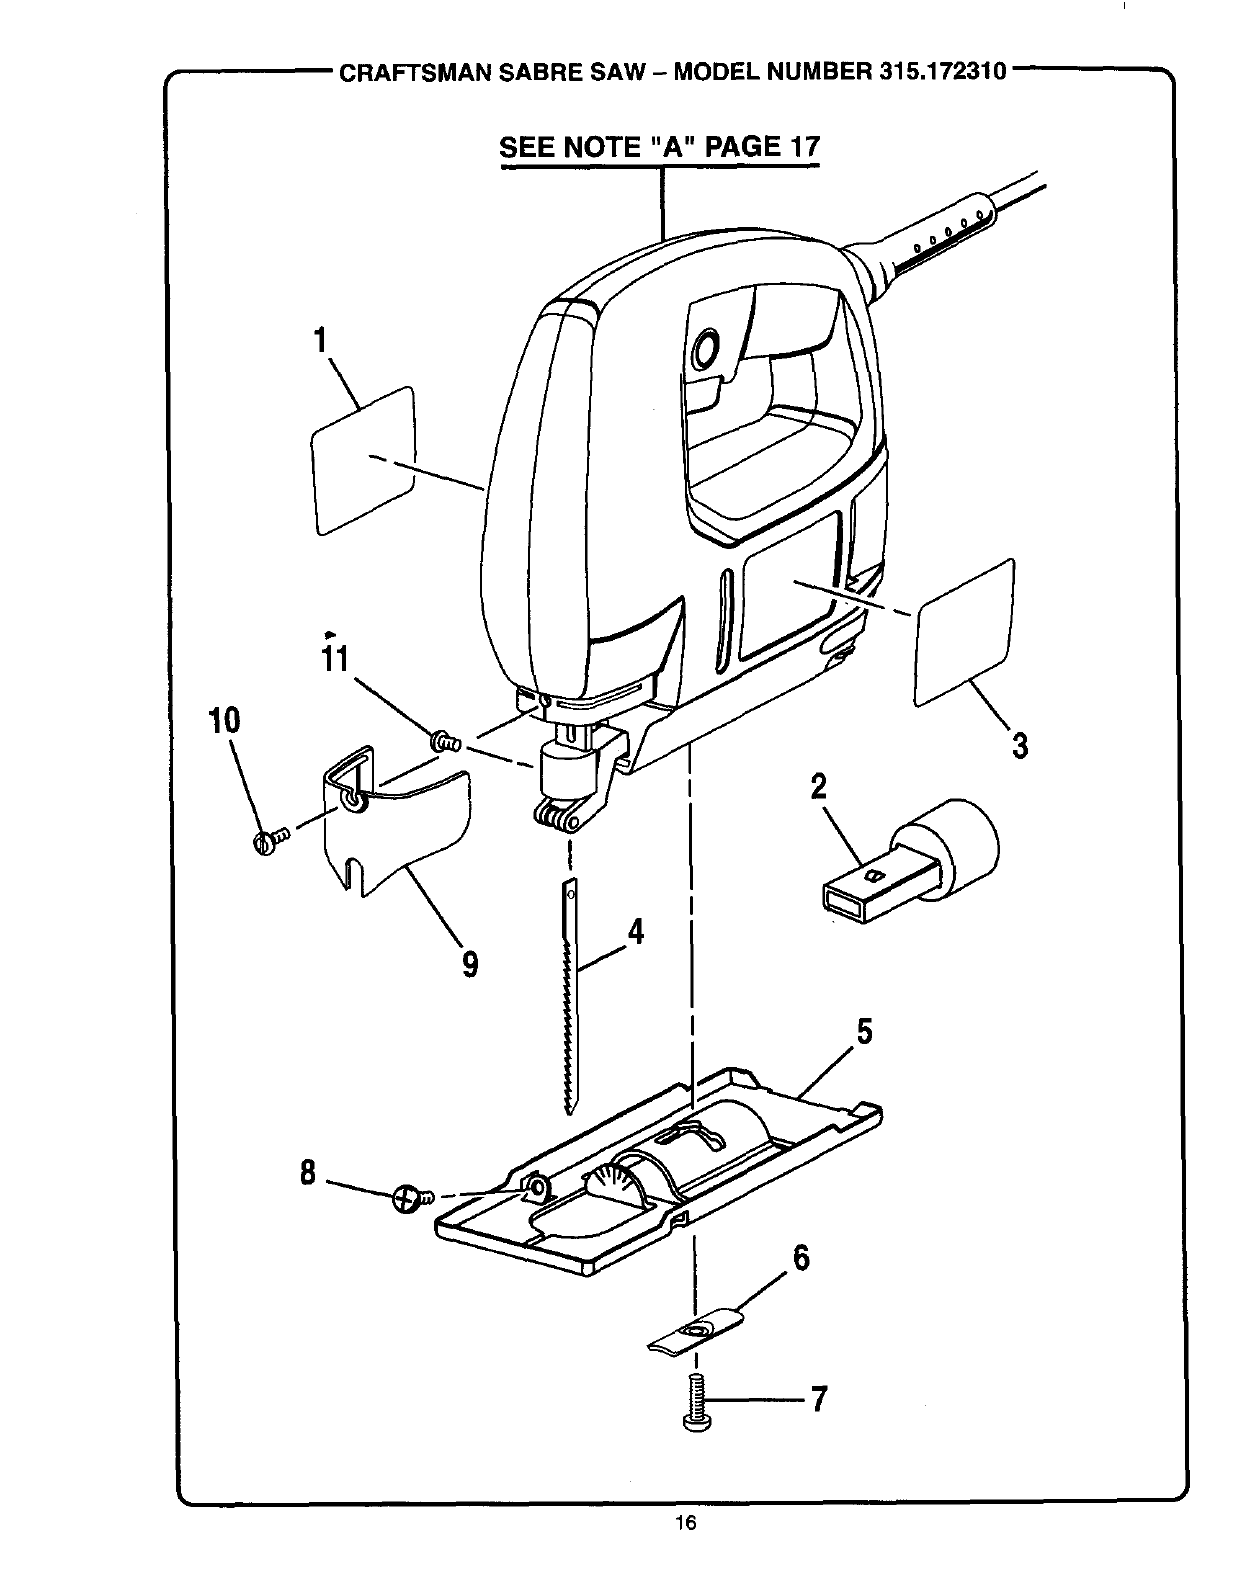 Craftsman 315172310 User Manual VARIABLE SPEED SABRE SAW